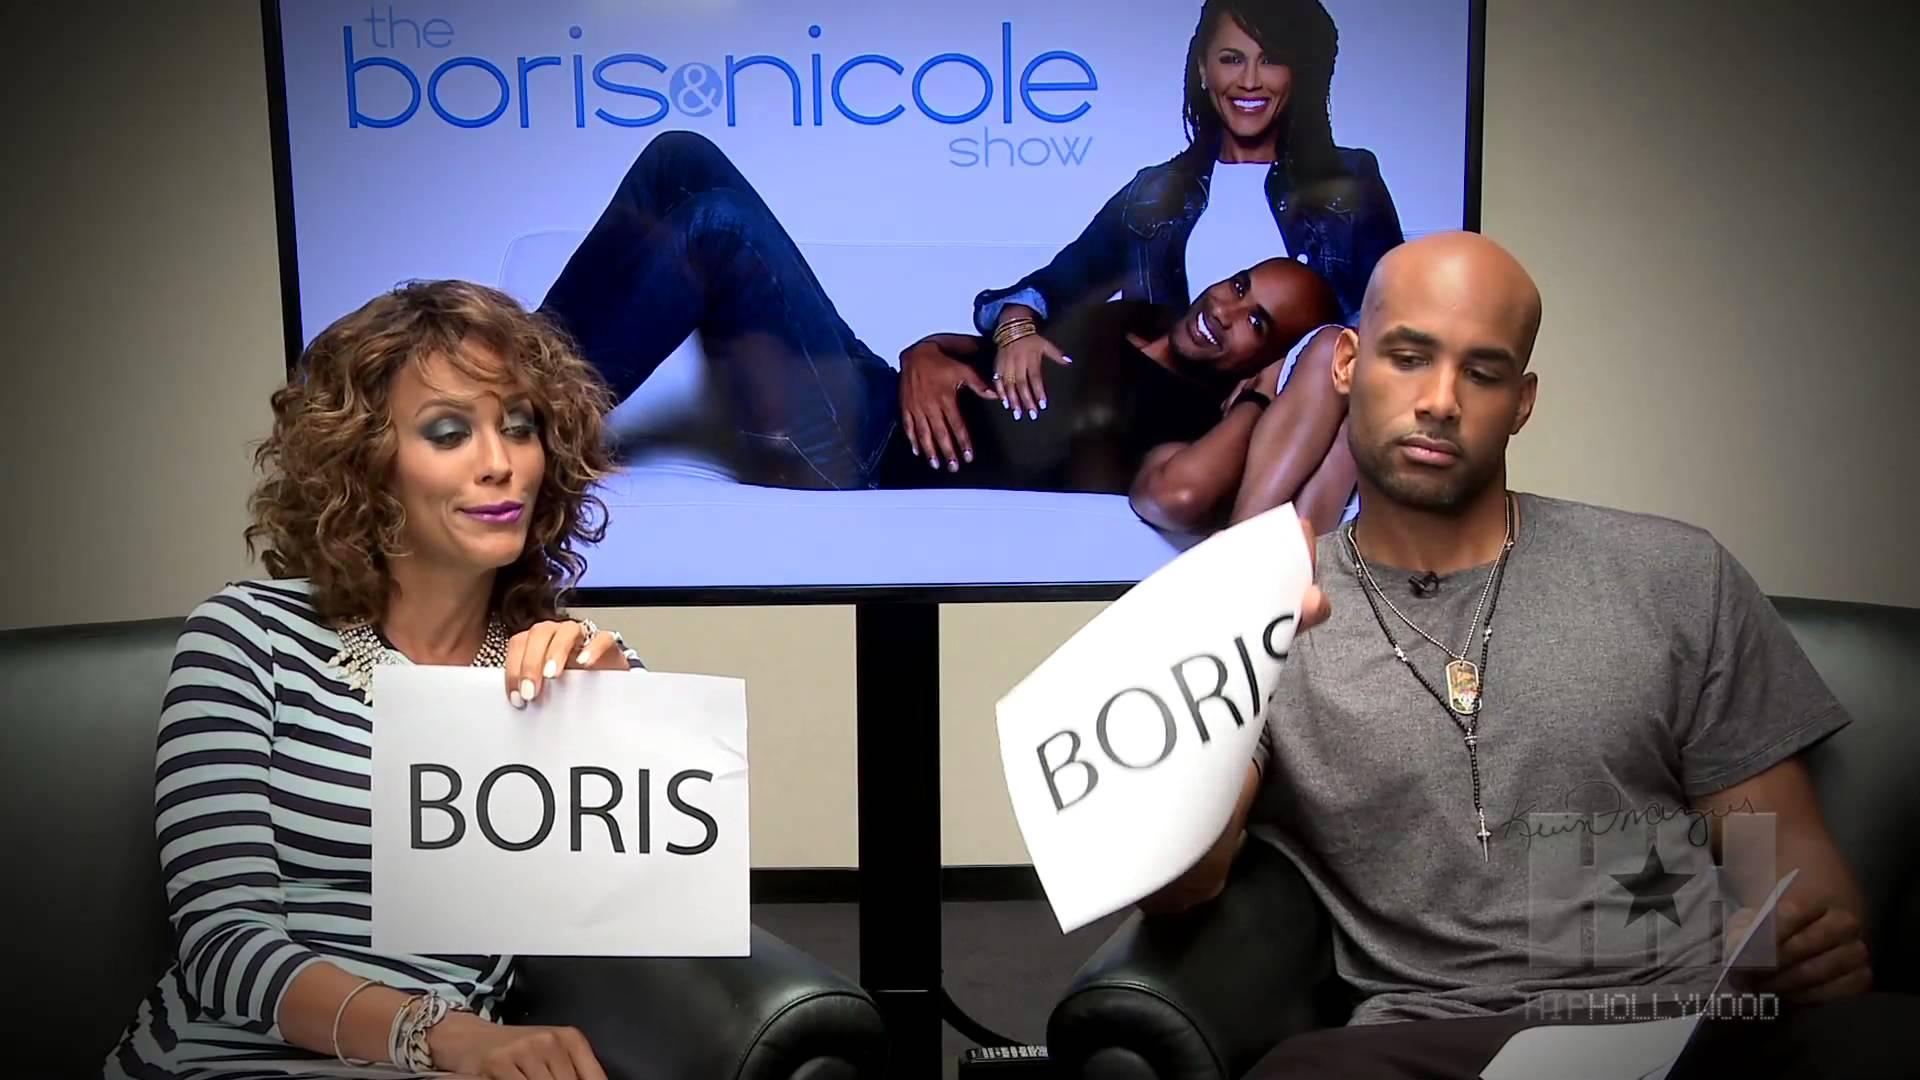 boris-nicole-show